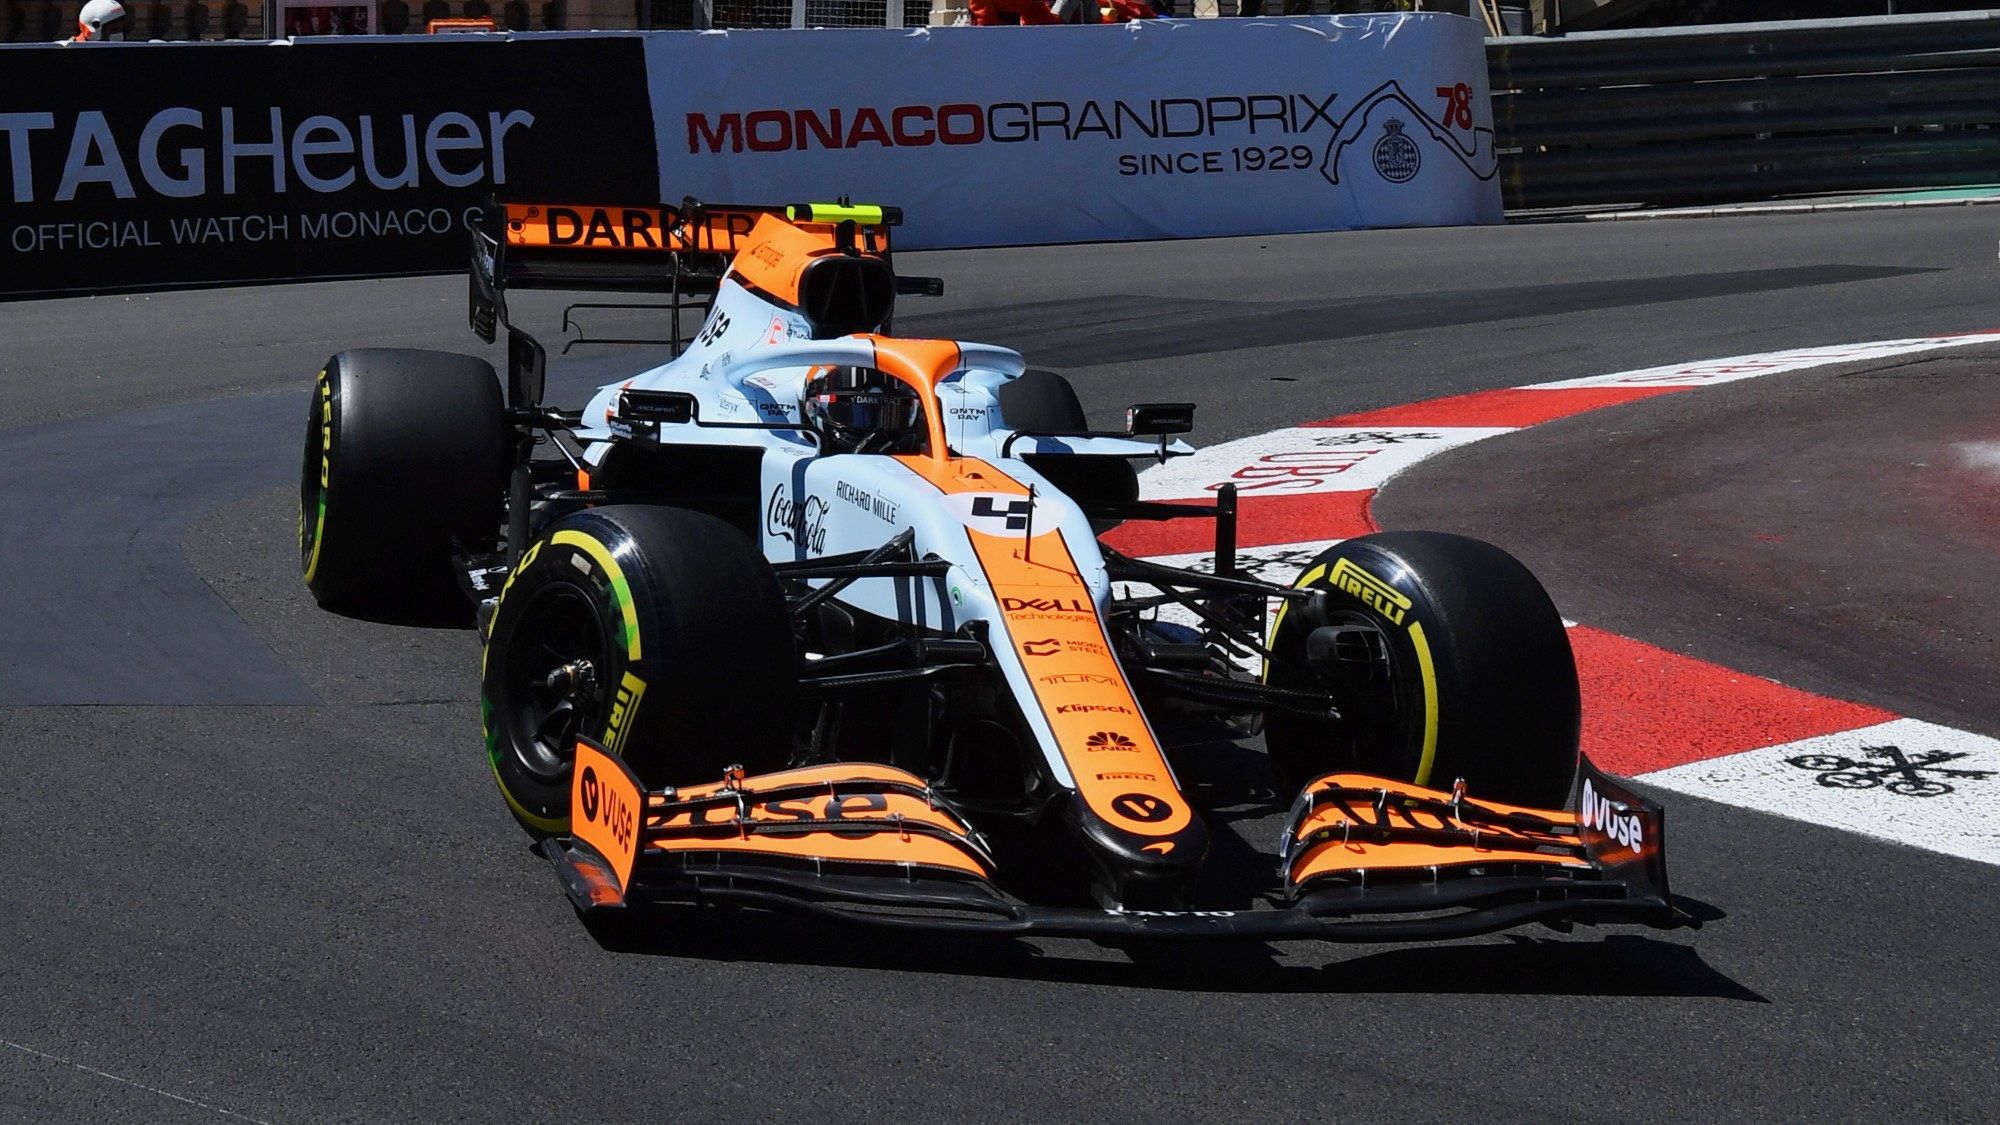 Monaco21Mcl